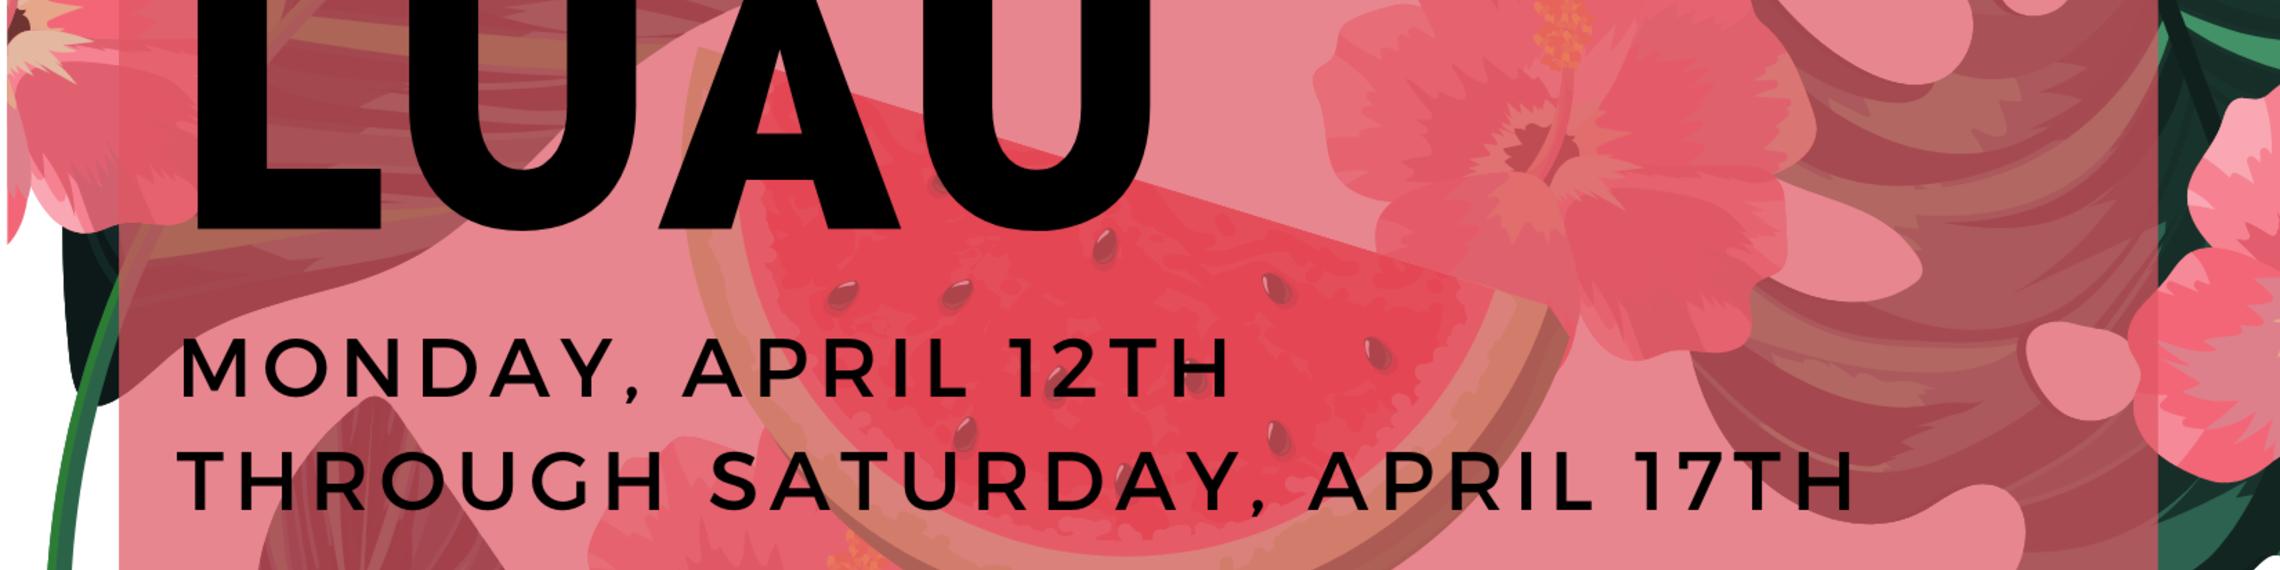 Luau Save The Date